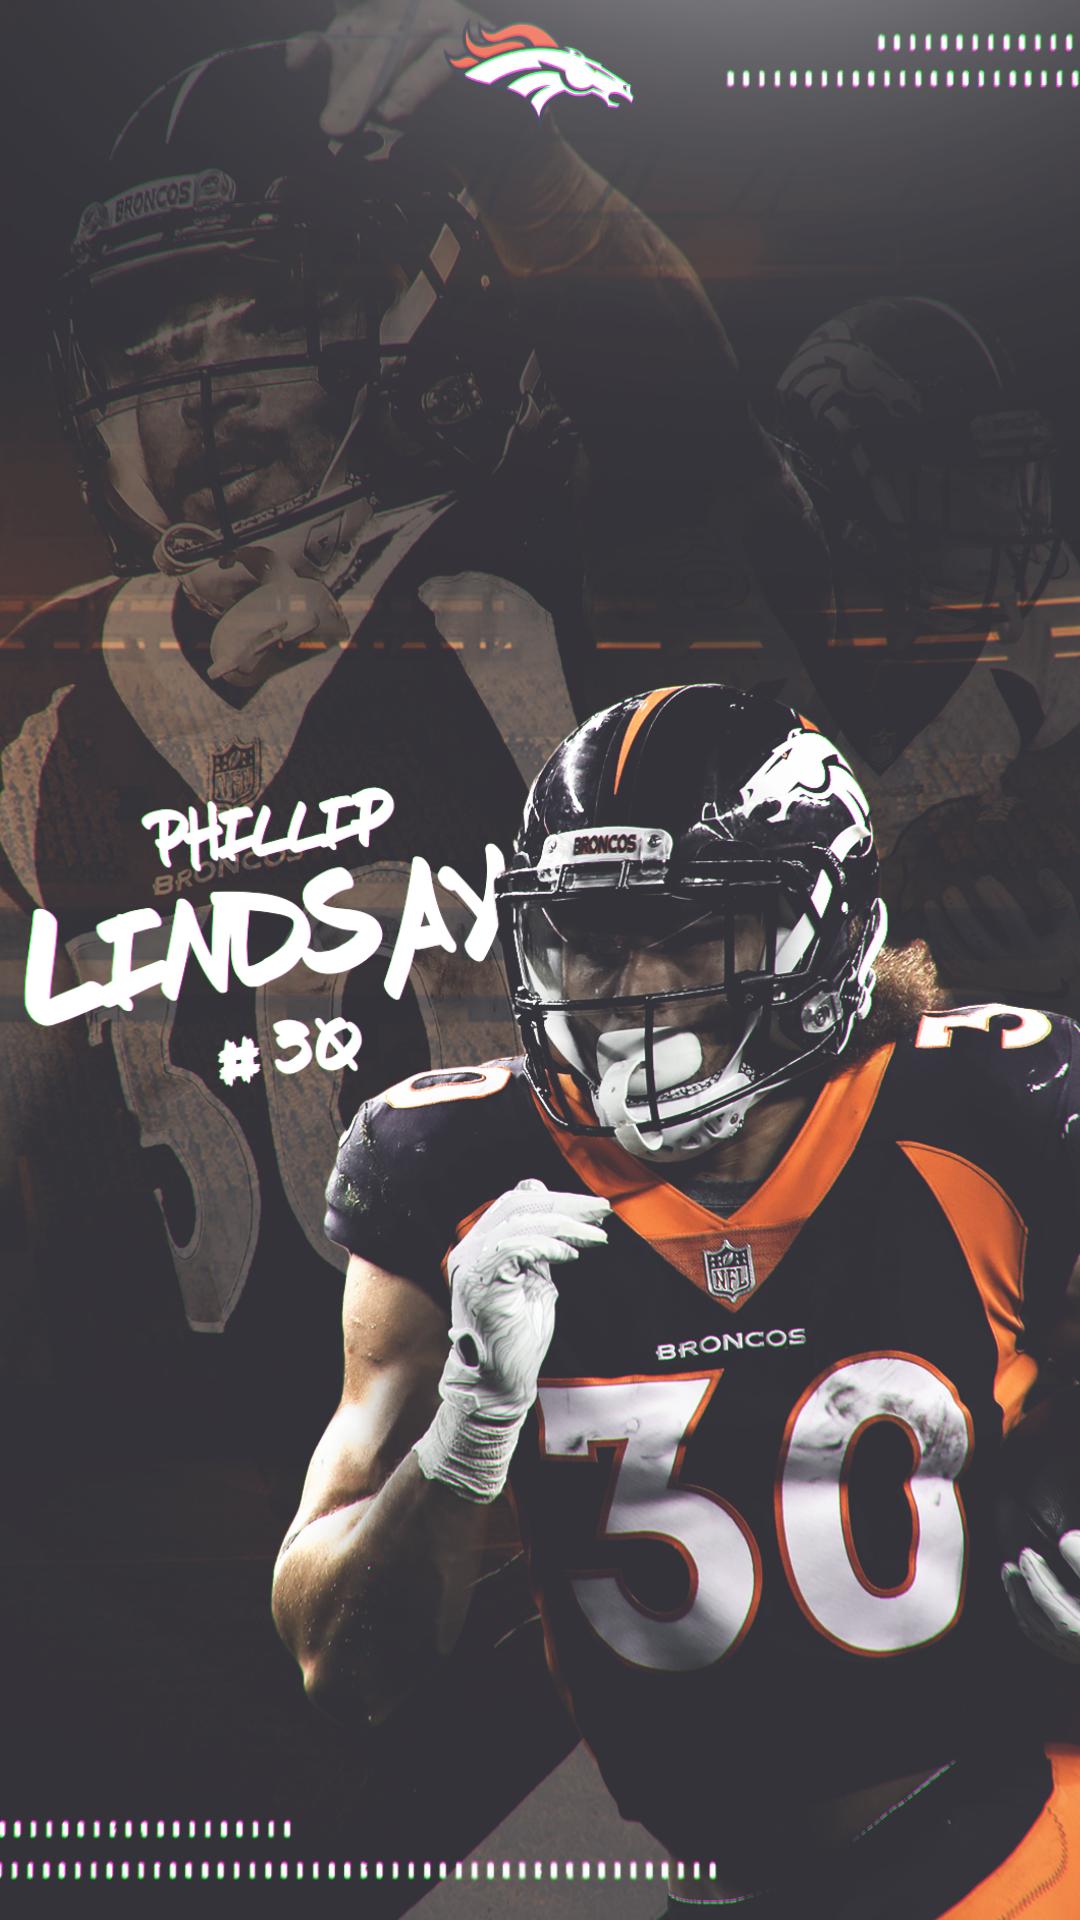 Pin by Santee Black on Denver Iphone wallpaper, Broncos